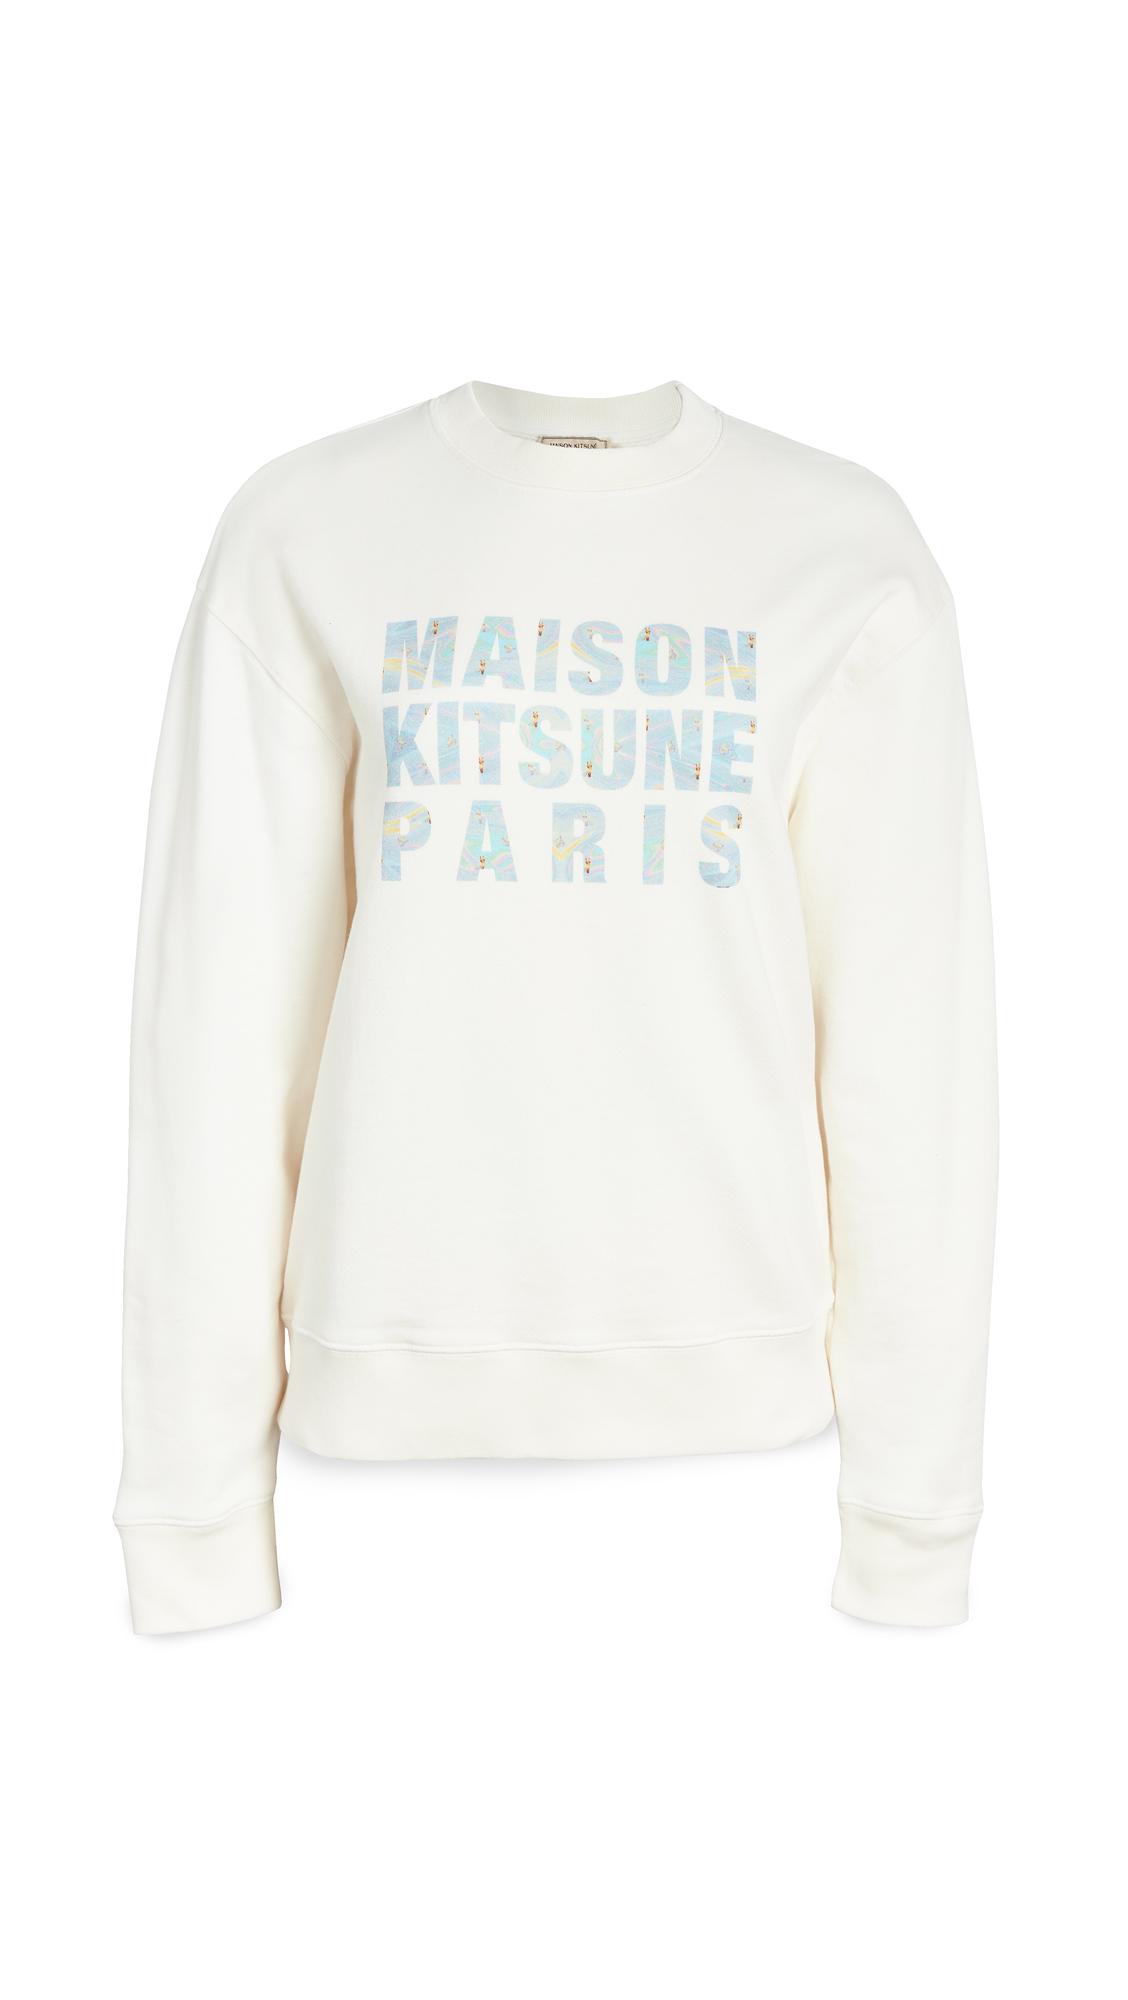 Maison Kitsune Sweatshirt Hologram Maison Kitsune Paris - 30% Off Sale